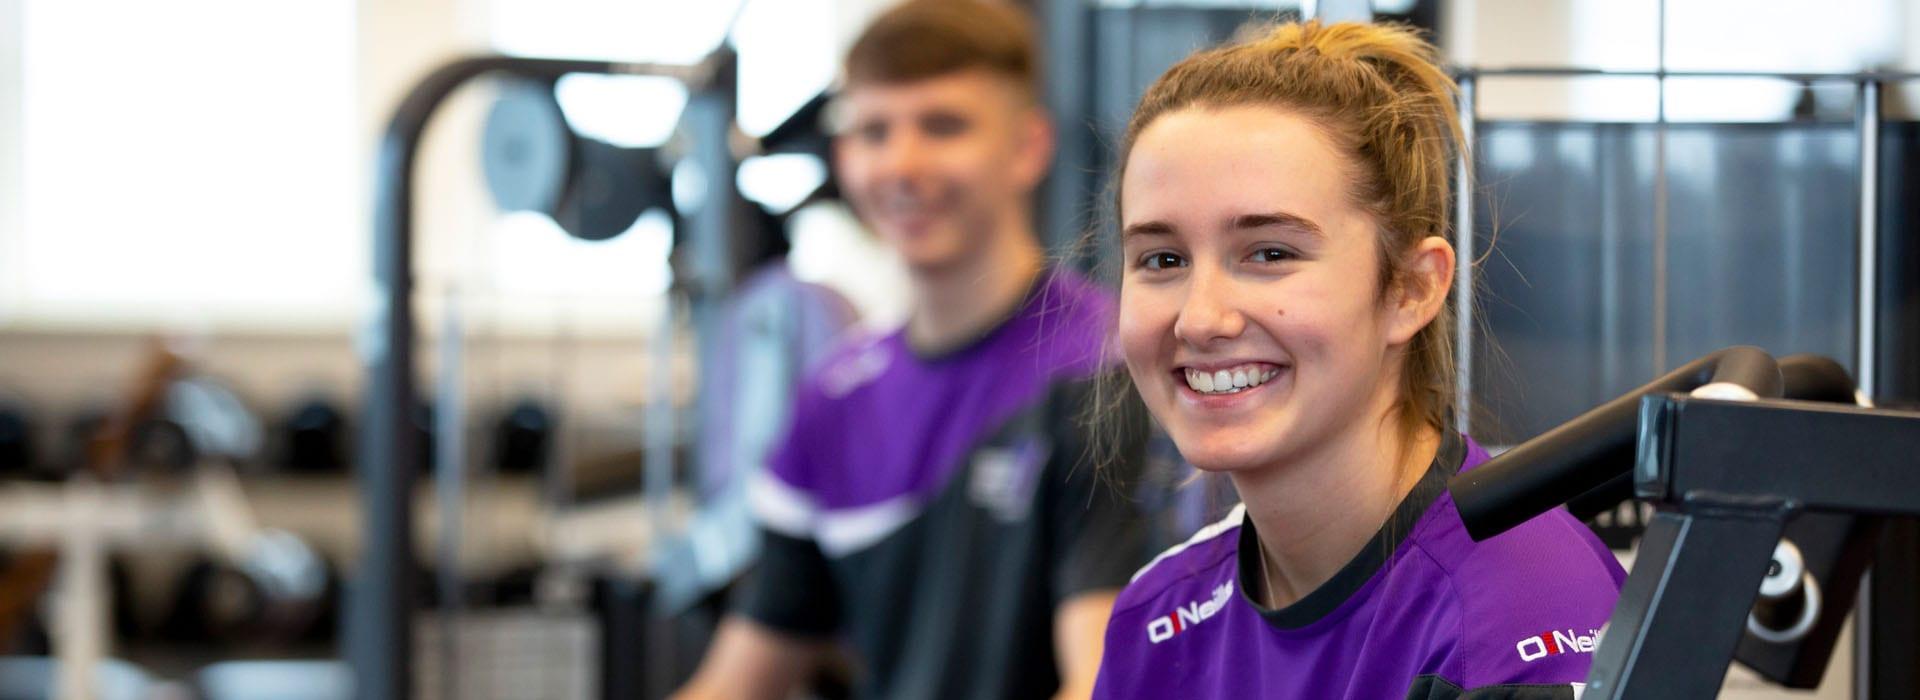 Sport Fitness & Uniformed Services